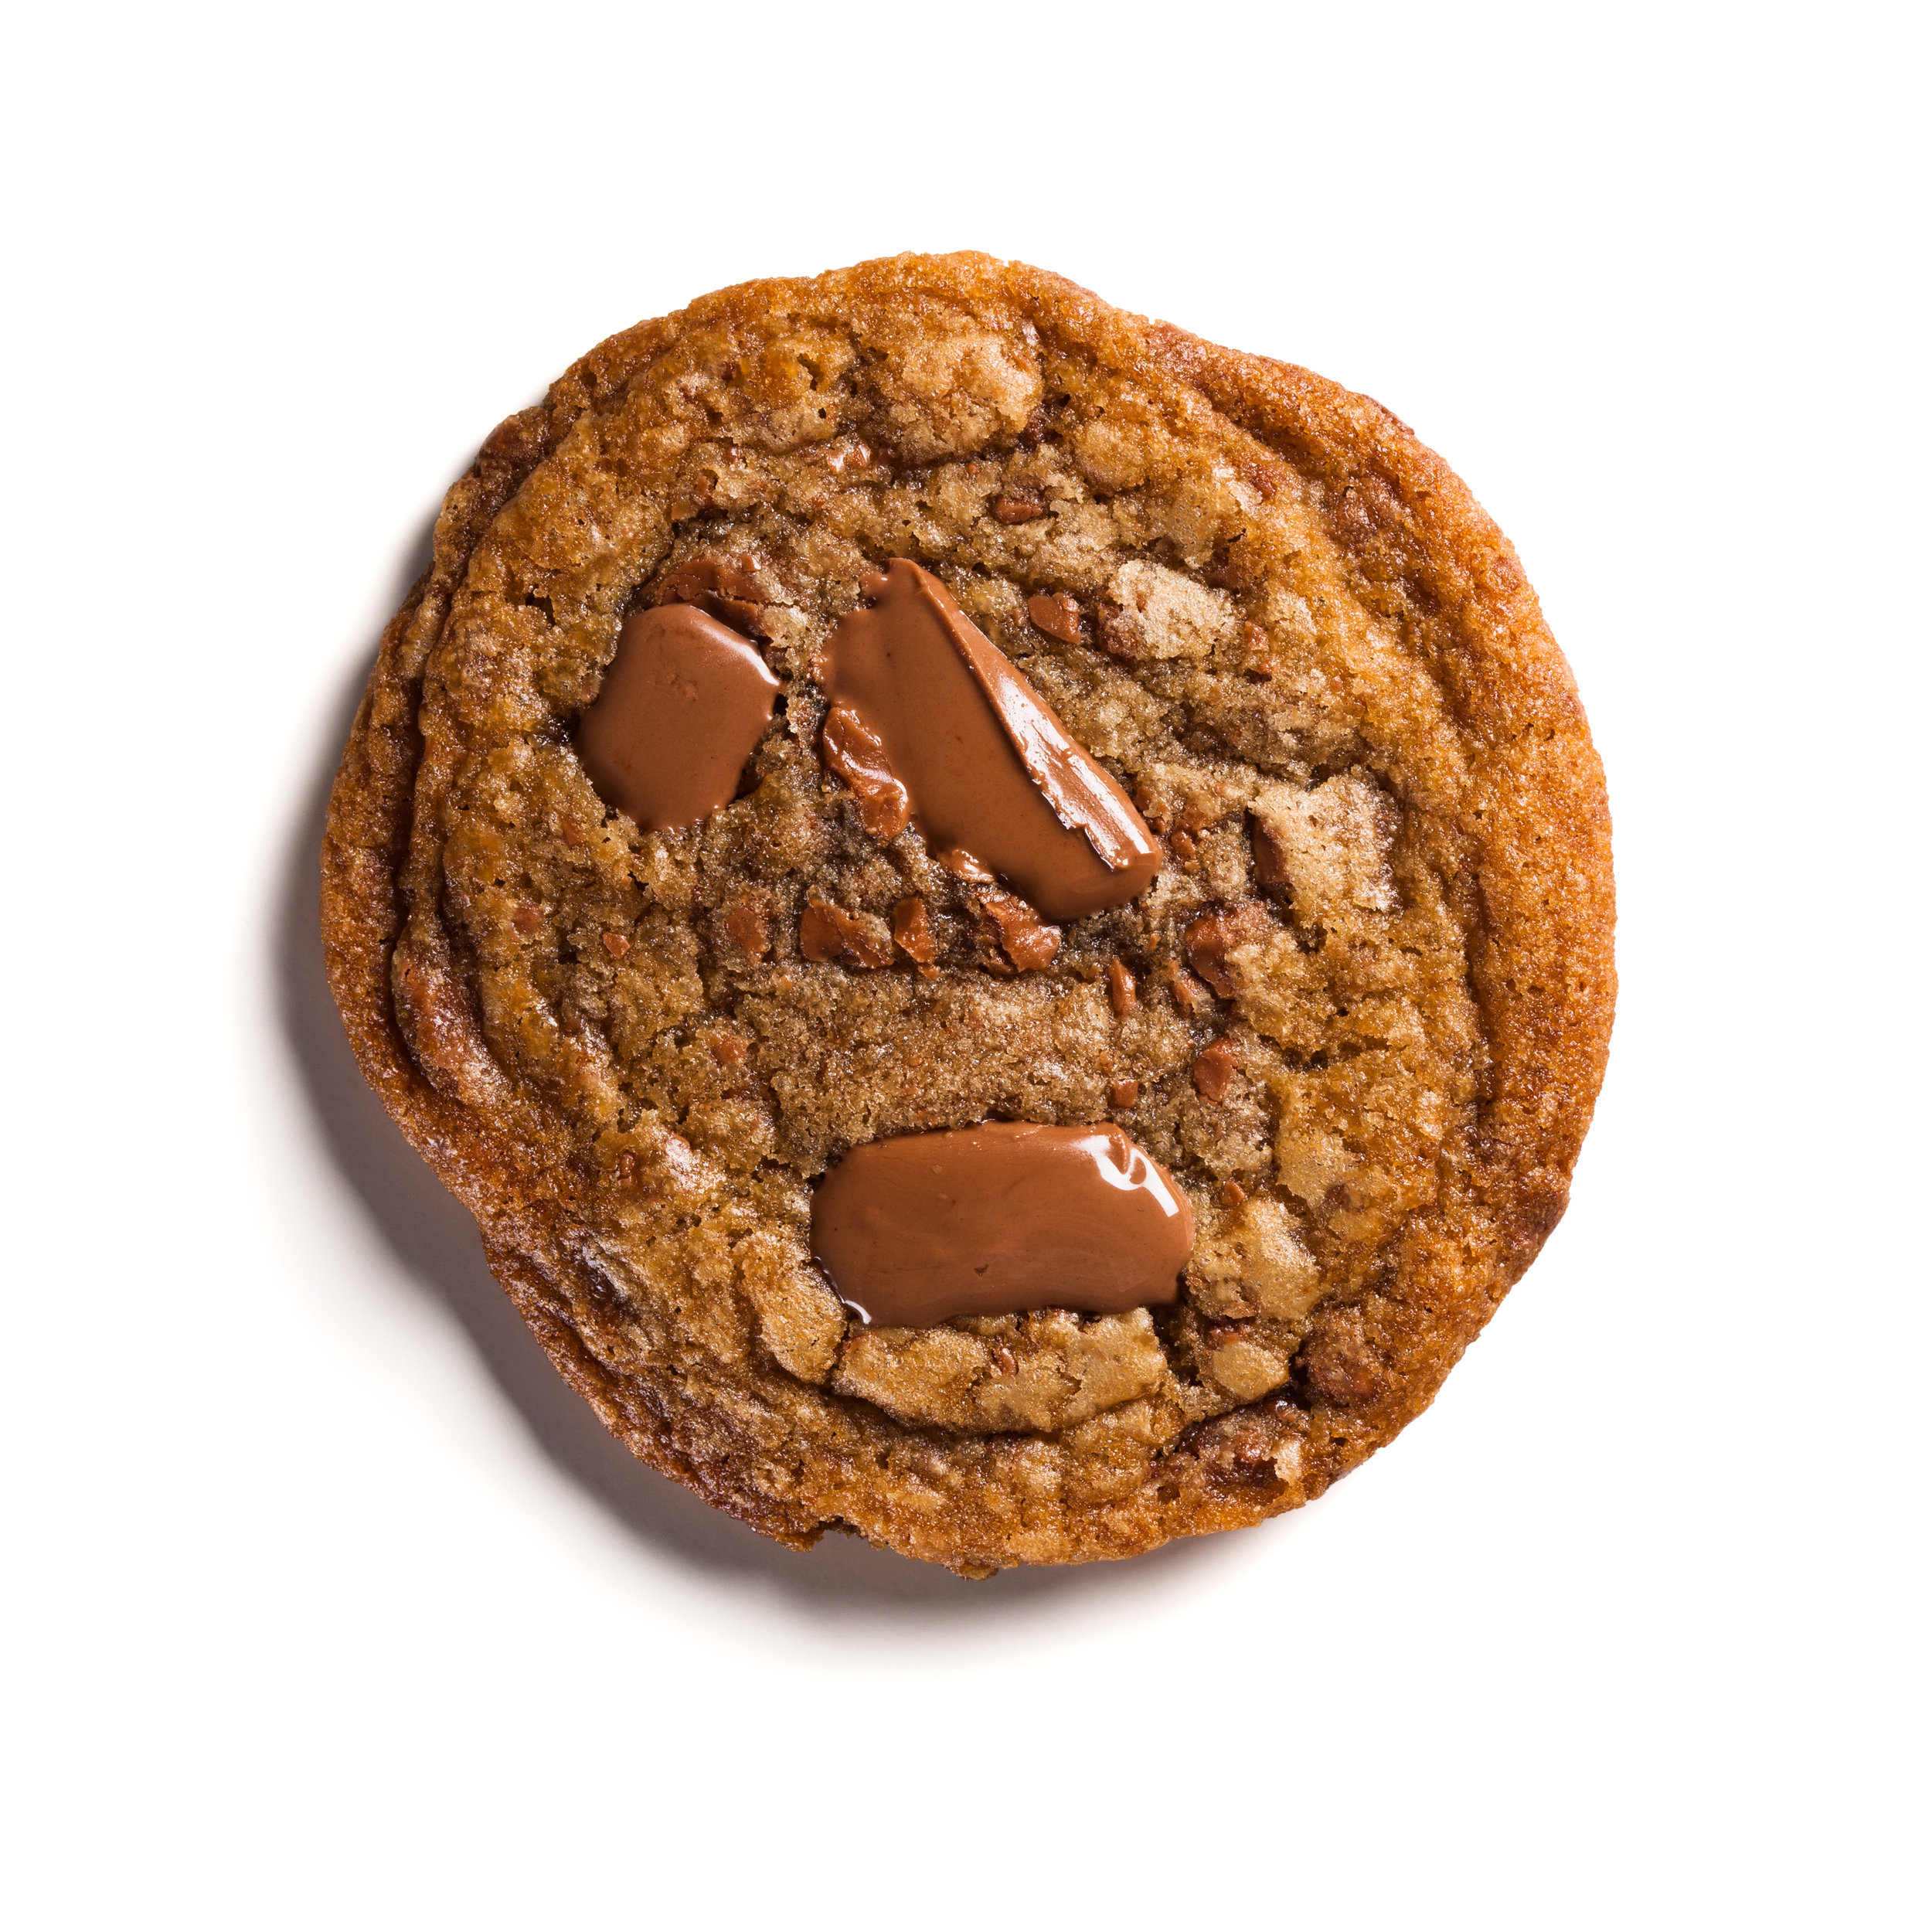 6cd81-felix-norton-cookie-milk-chocolate.jpgfelix-norton-cookie-milk-chocolate.jpg